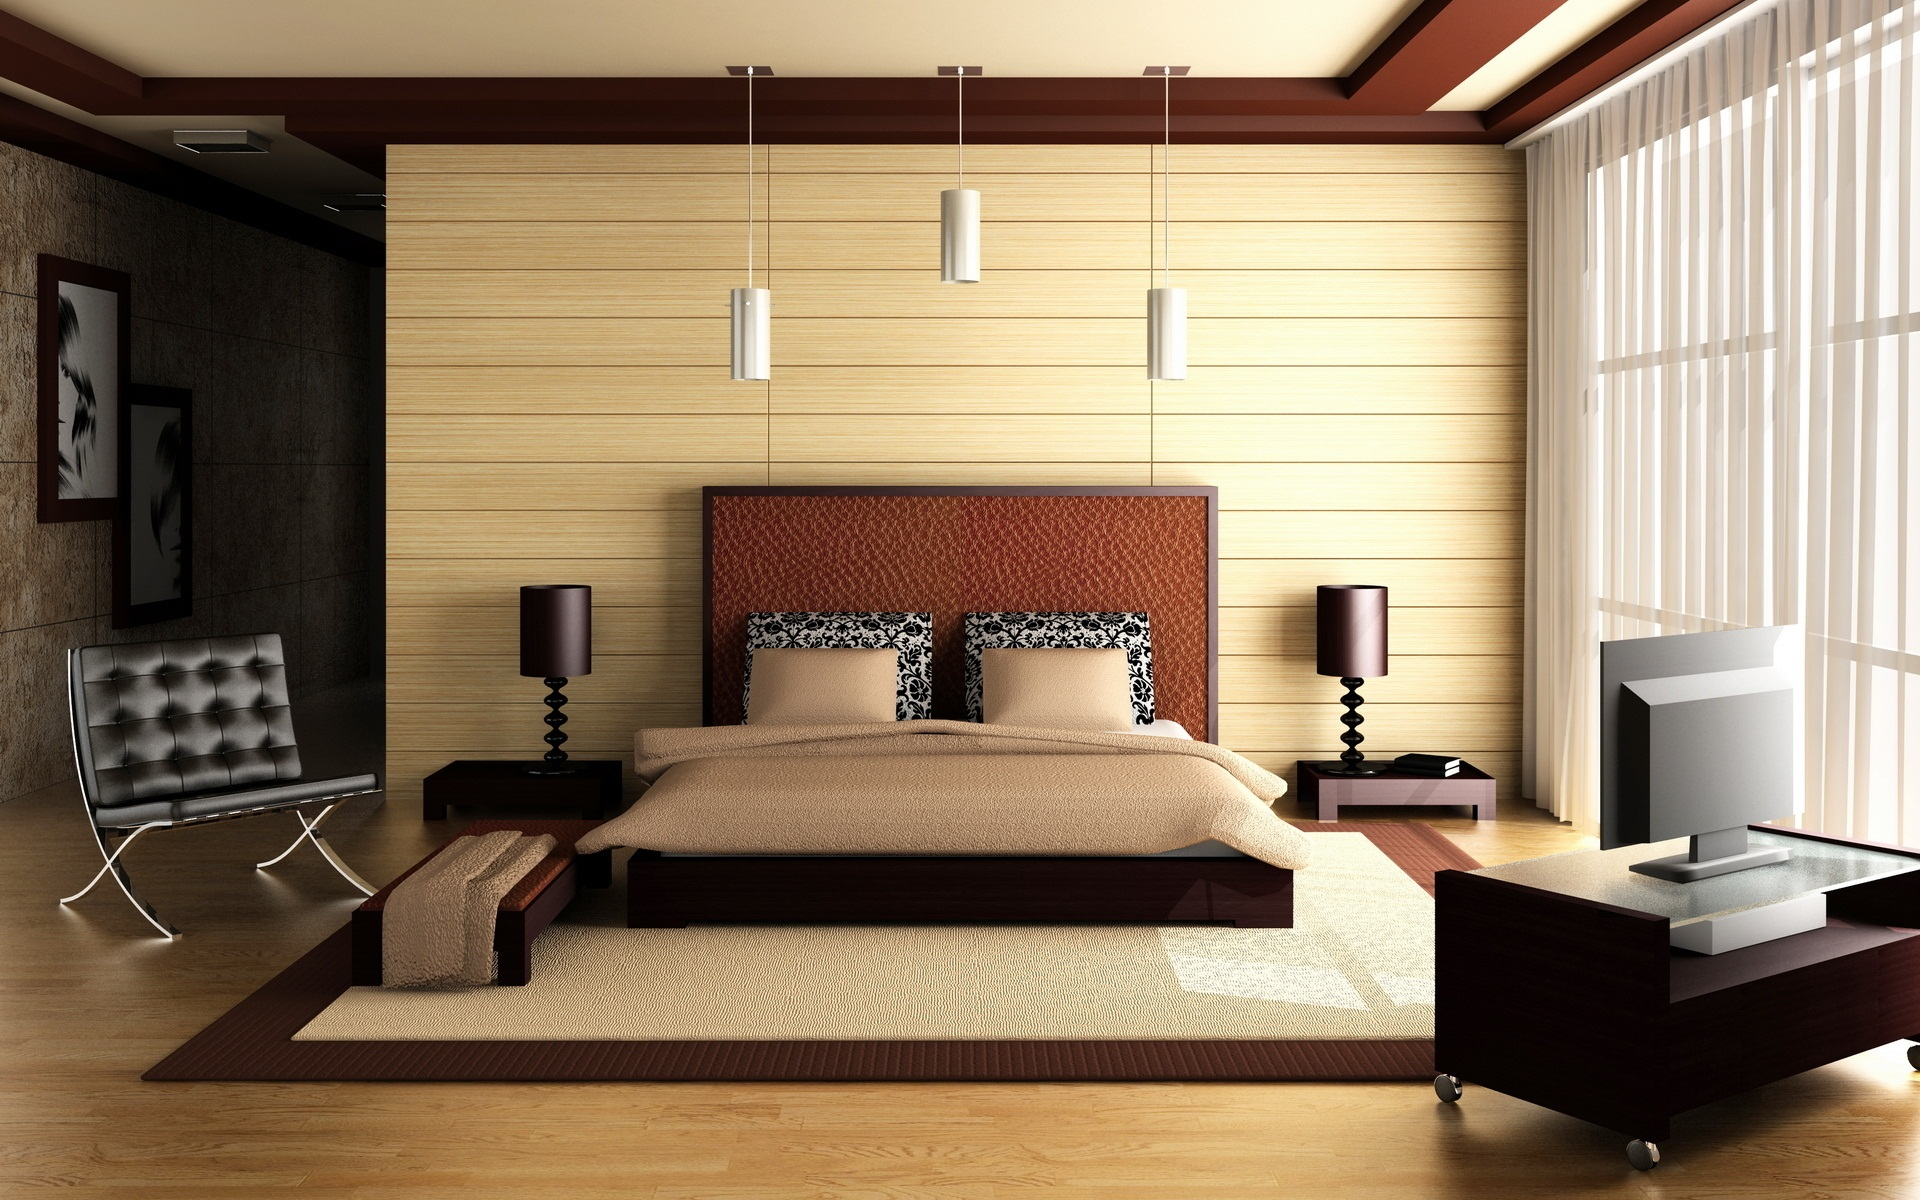 Architectural Interior Design Bedroom - 7x7 - Download HD